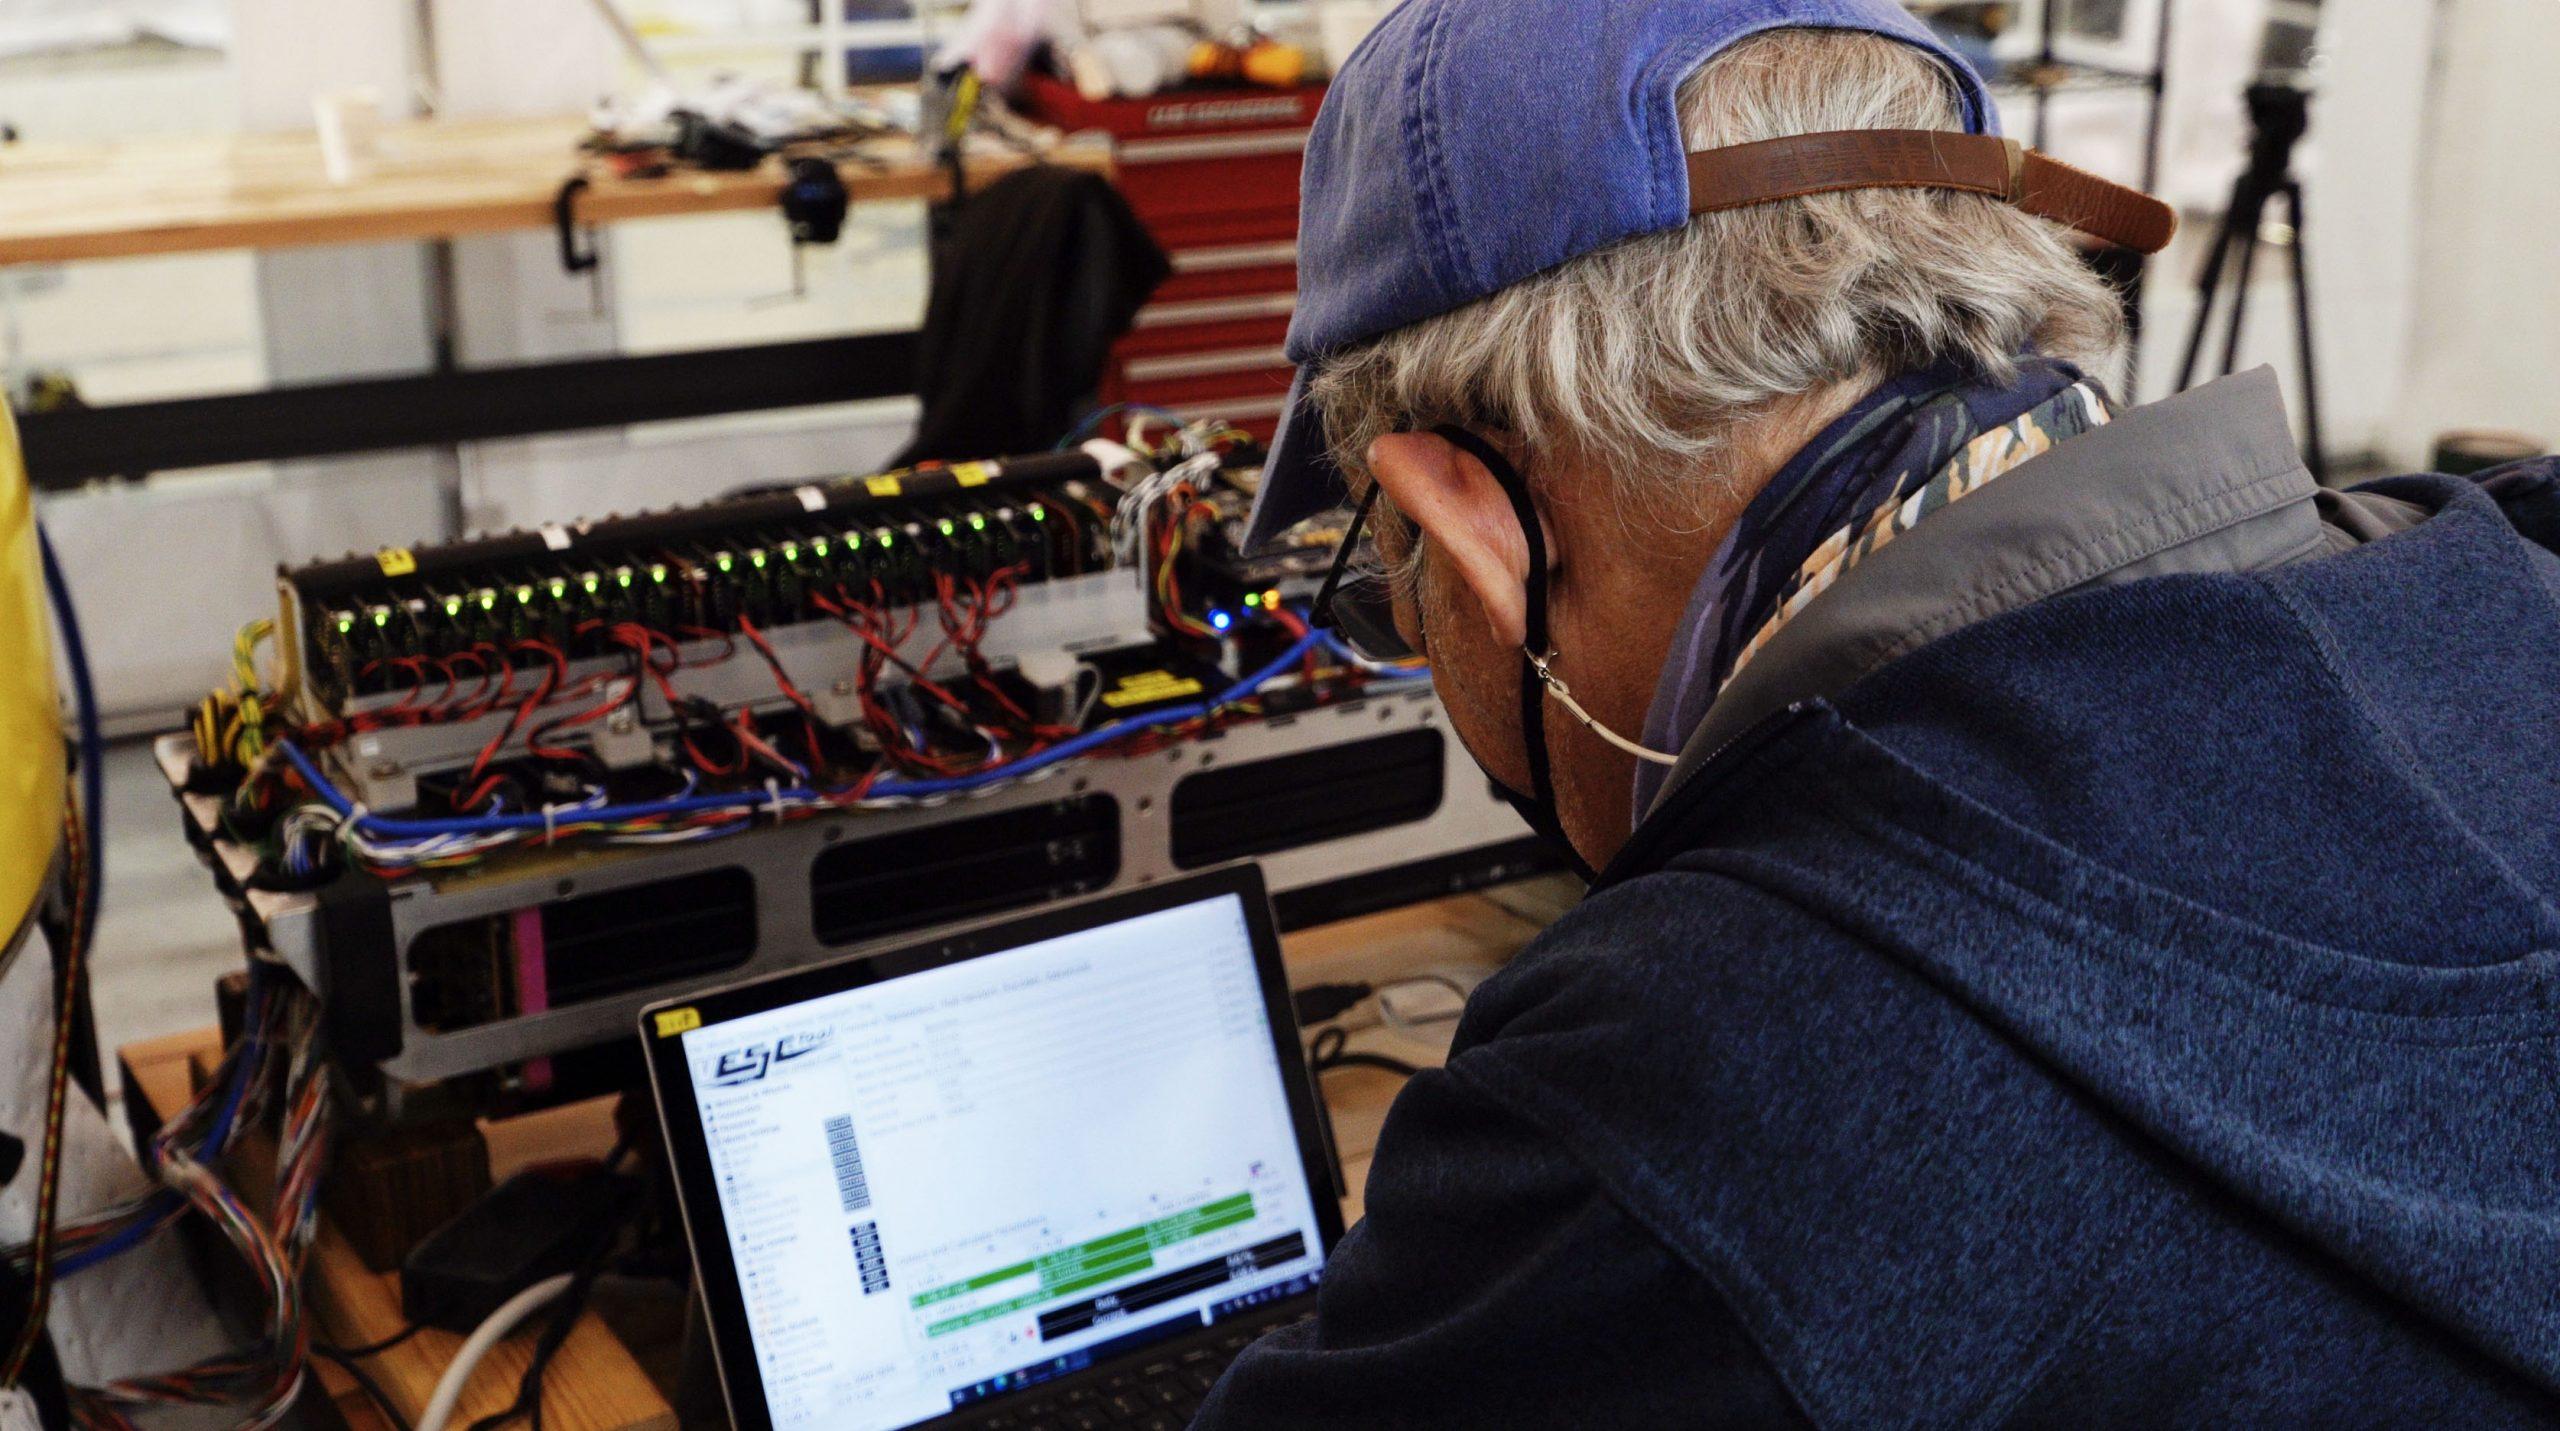 WHOI Senior Scientist Dana Yoerger Dana Yoerger tests Mesobot's thrusters.